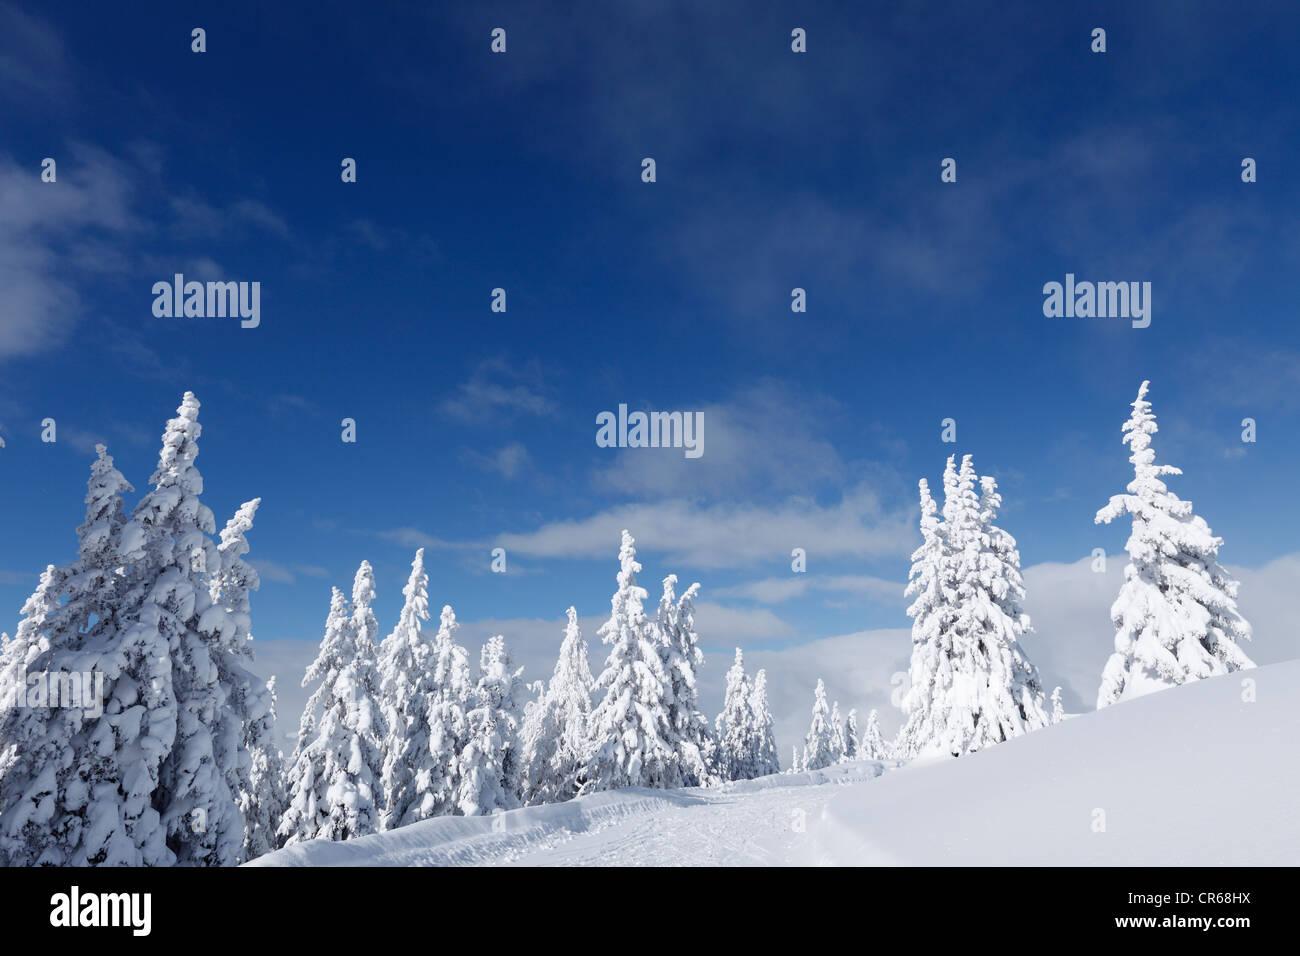 Austria, Salzburg, View of snow covered firs on Gasslhohe mountain - Stock Image